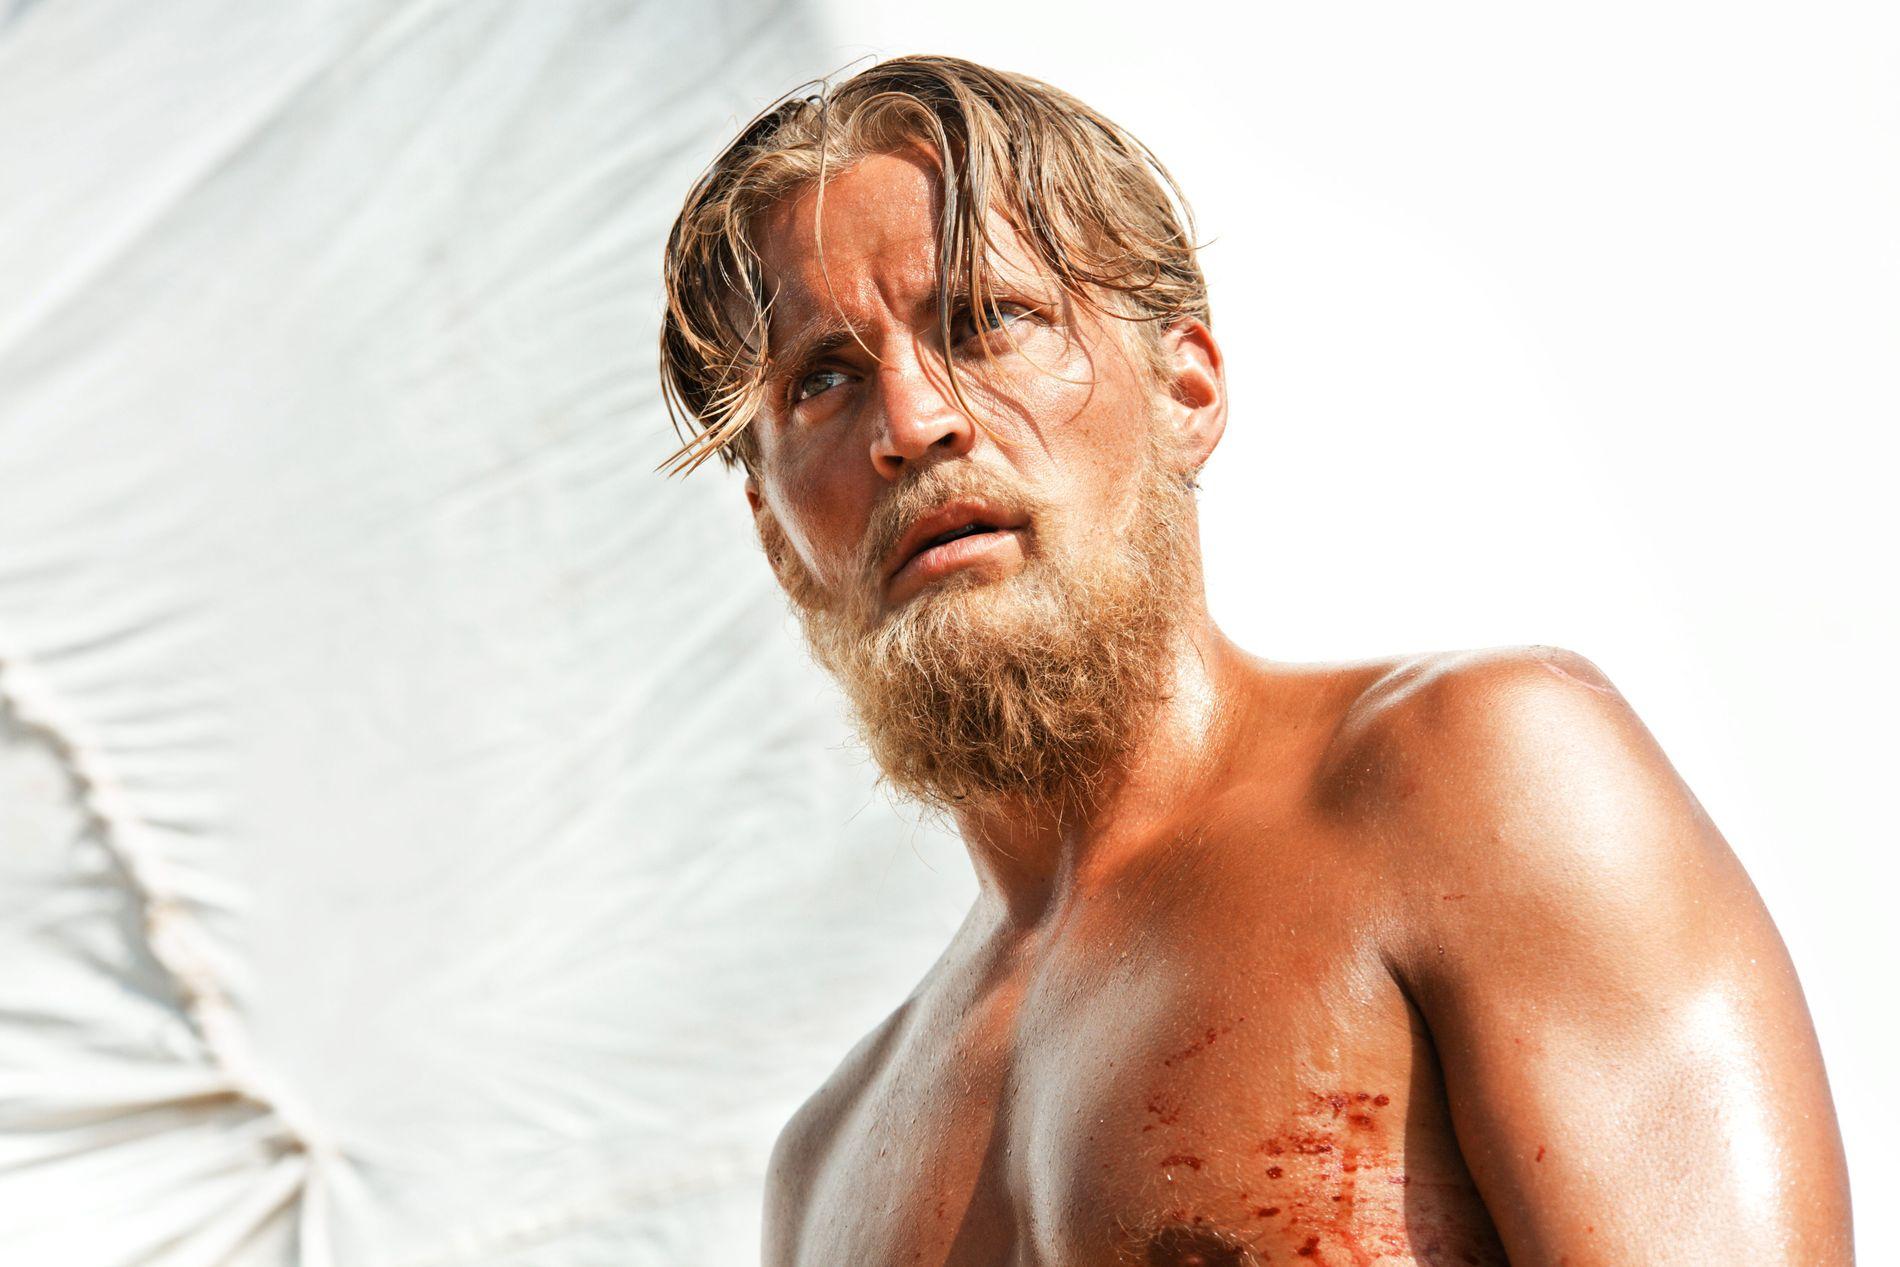 OSCARNOMINERT: Tobias Santelmann som Knut Haugland i «Kon-Tiki» som var Oscar-nominert i 2013.